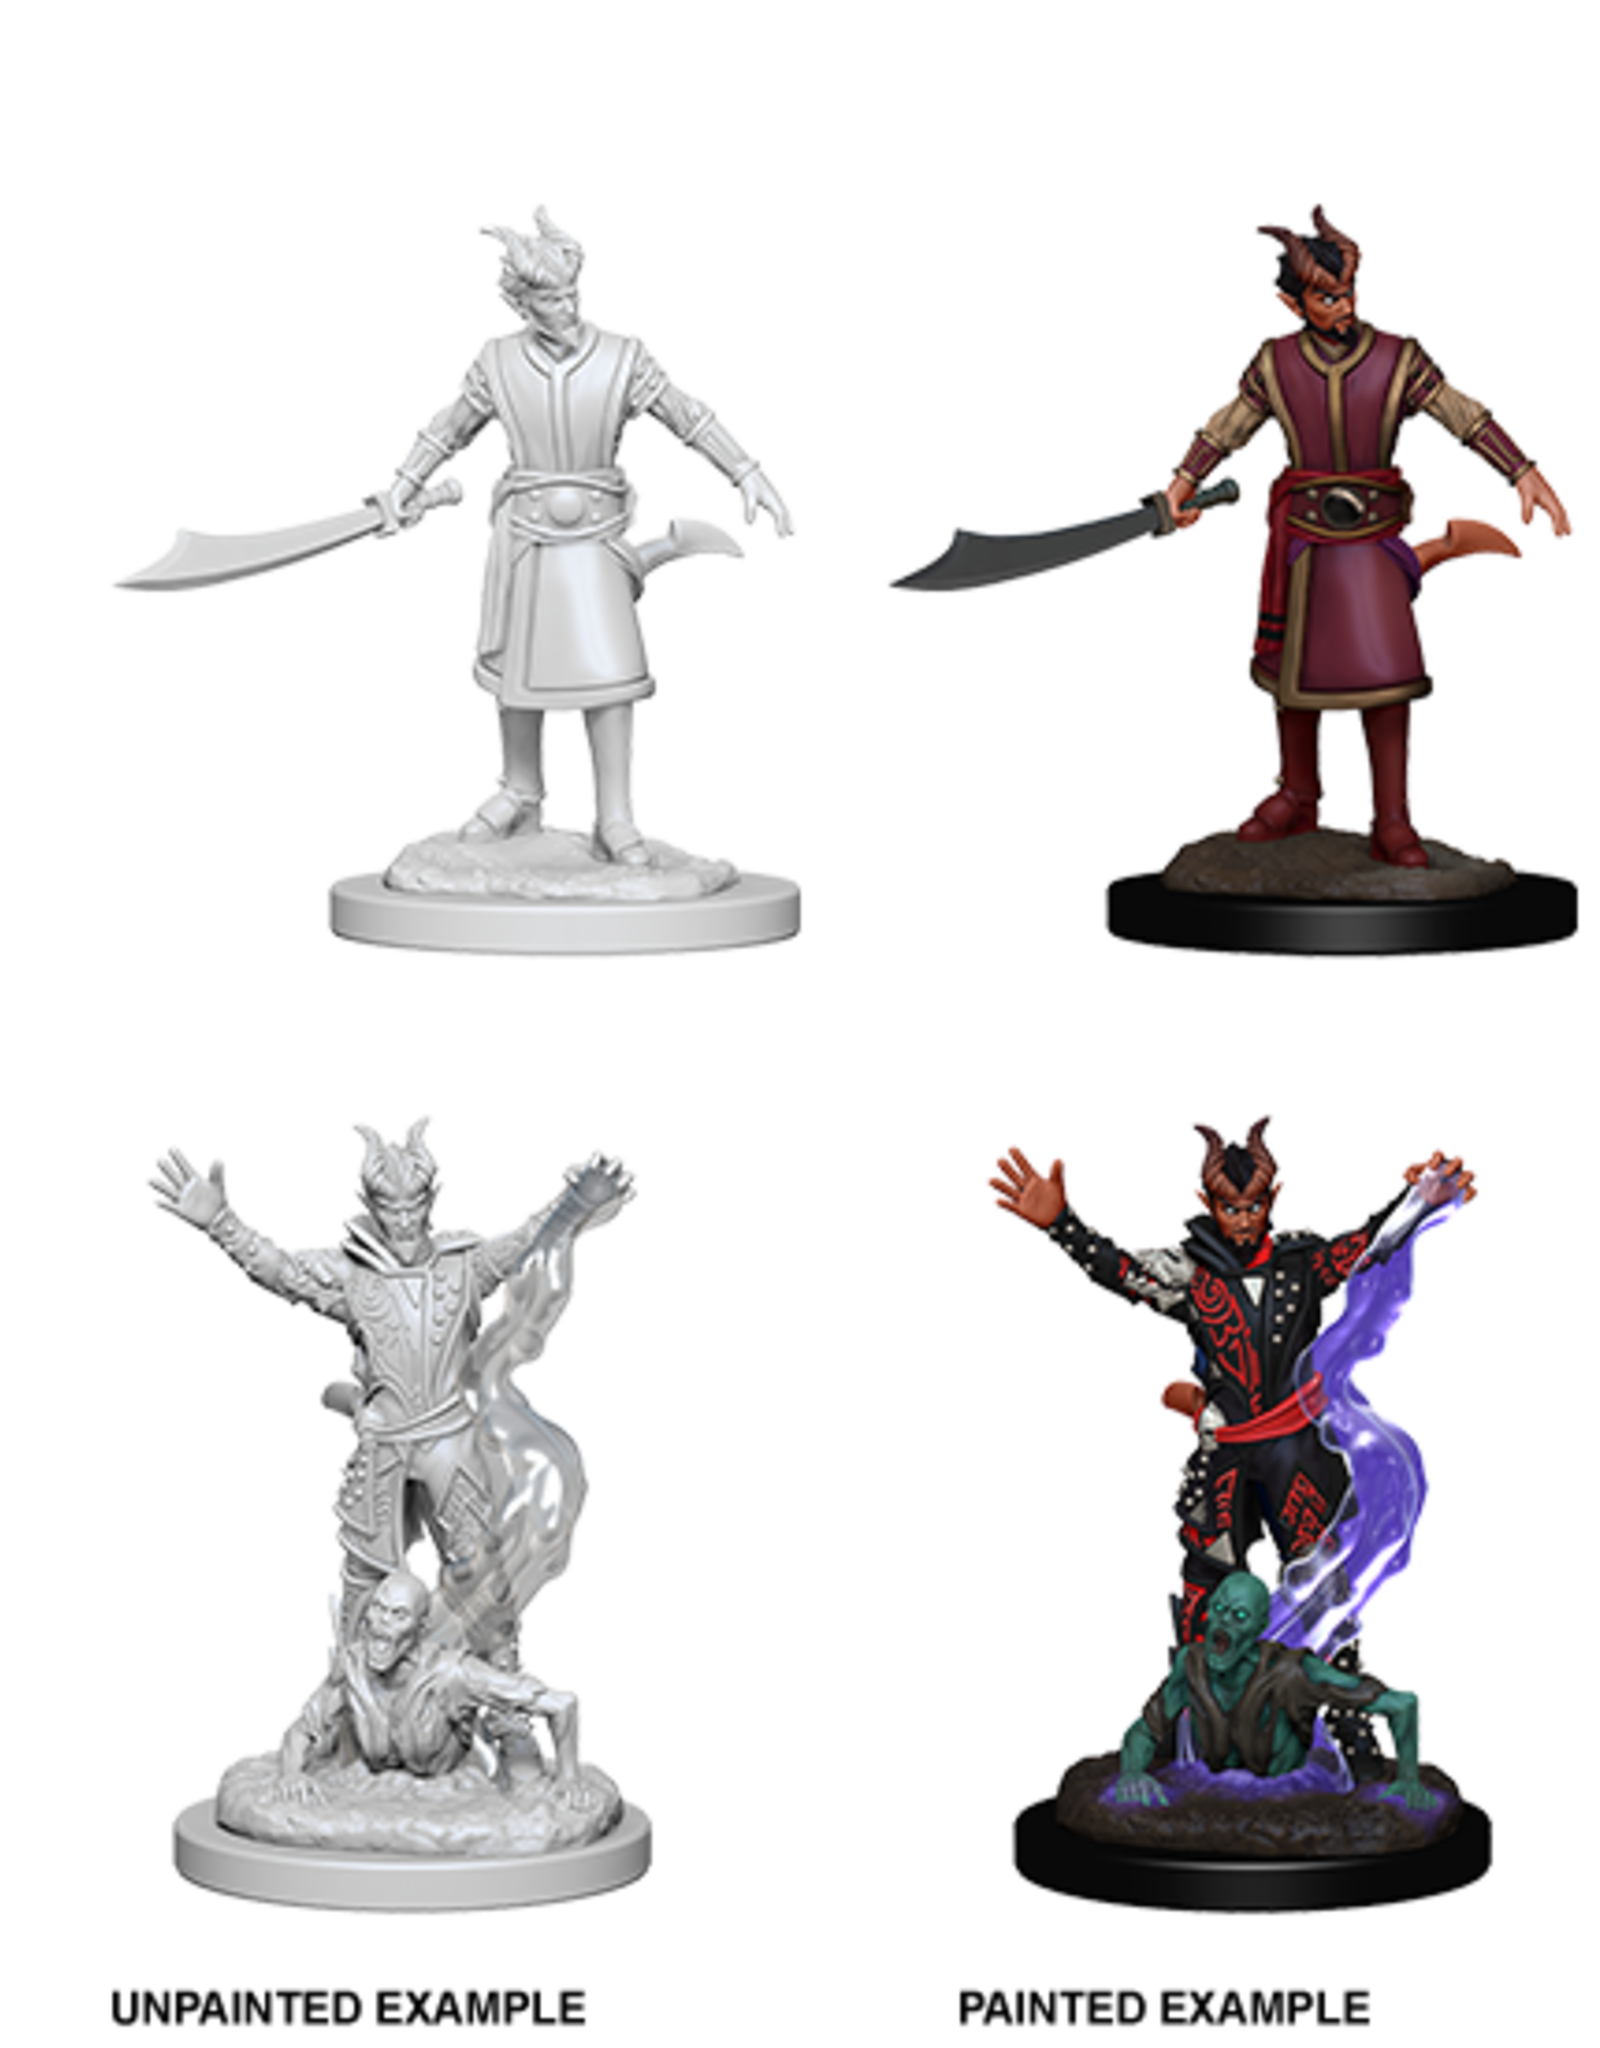 Wizkids D&D Nolzur's Marvelous Miniatures Tiefling Warlock Male